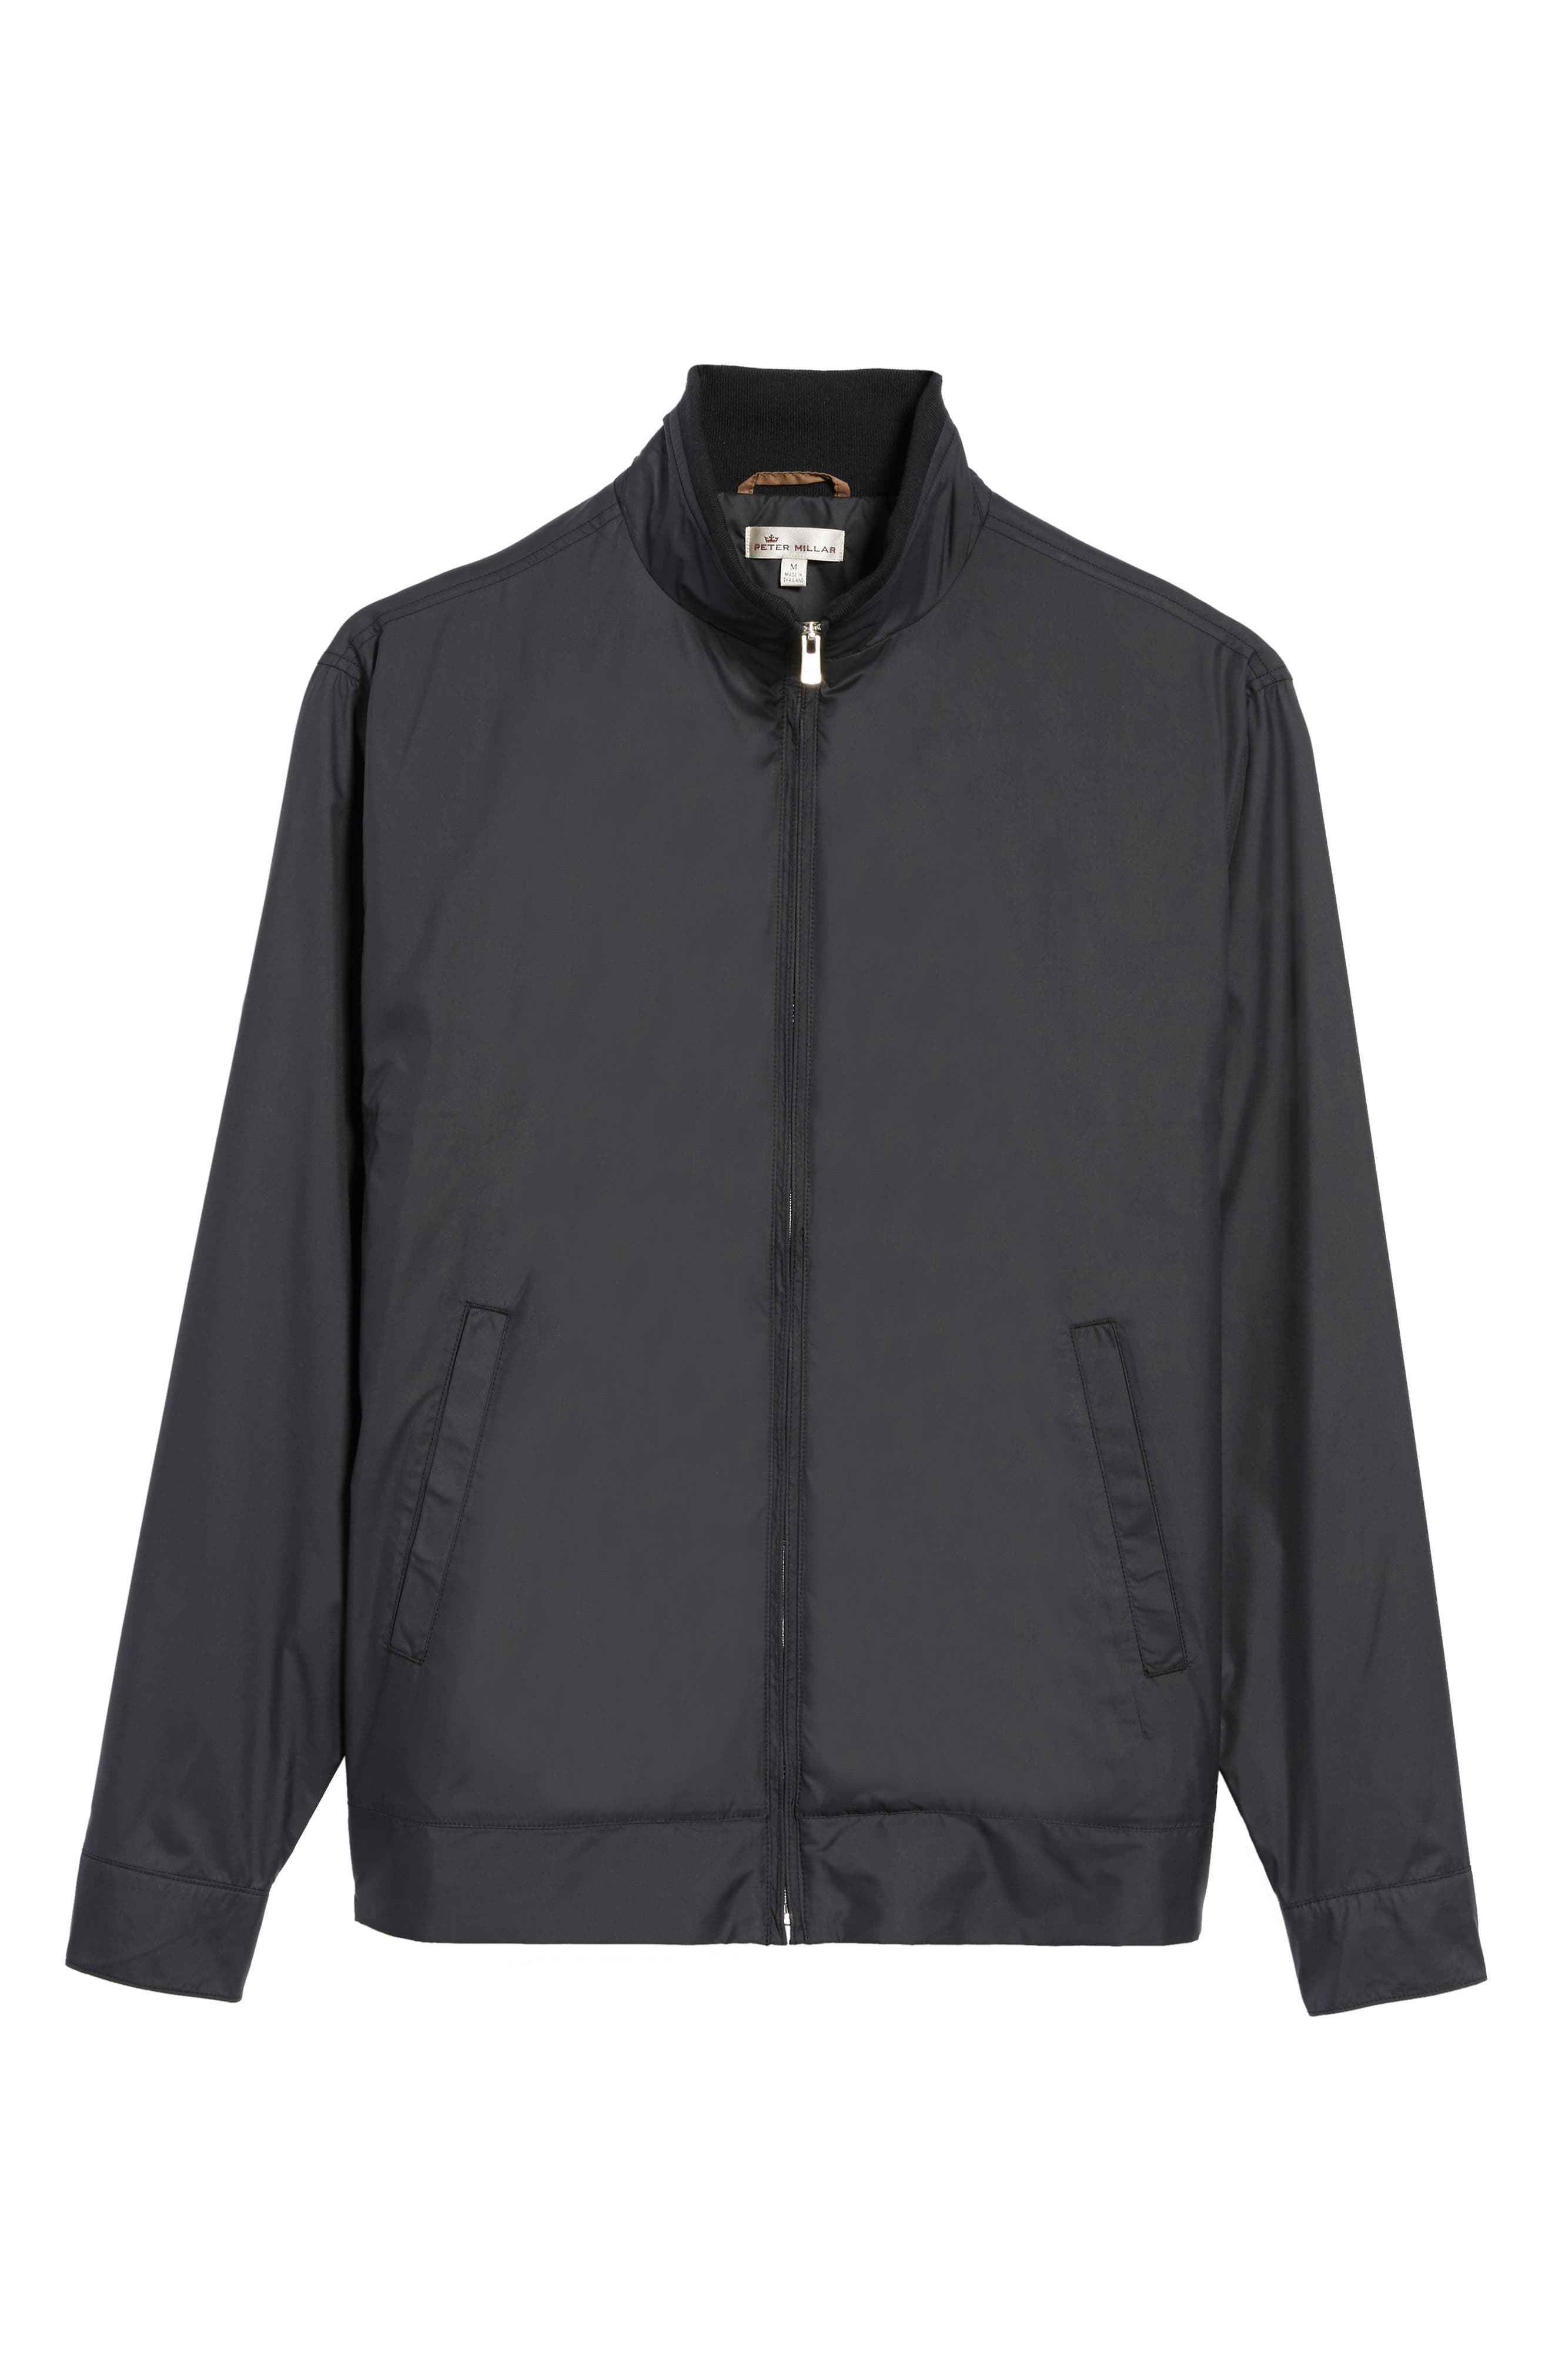 PETER MILLAR, Zip Jacket, Alternate thumbnail 6, color, BLACK